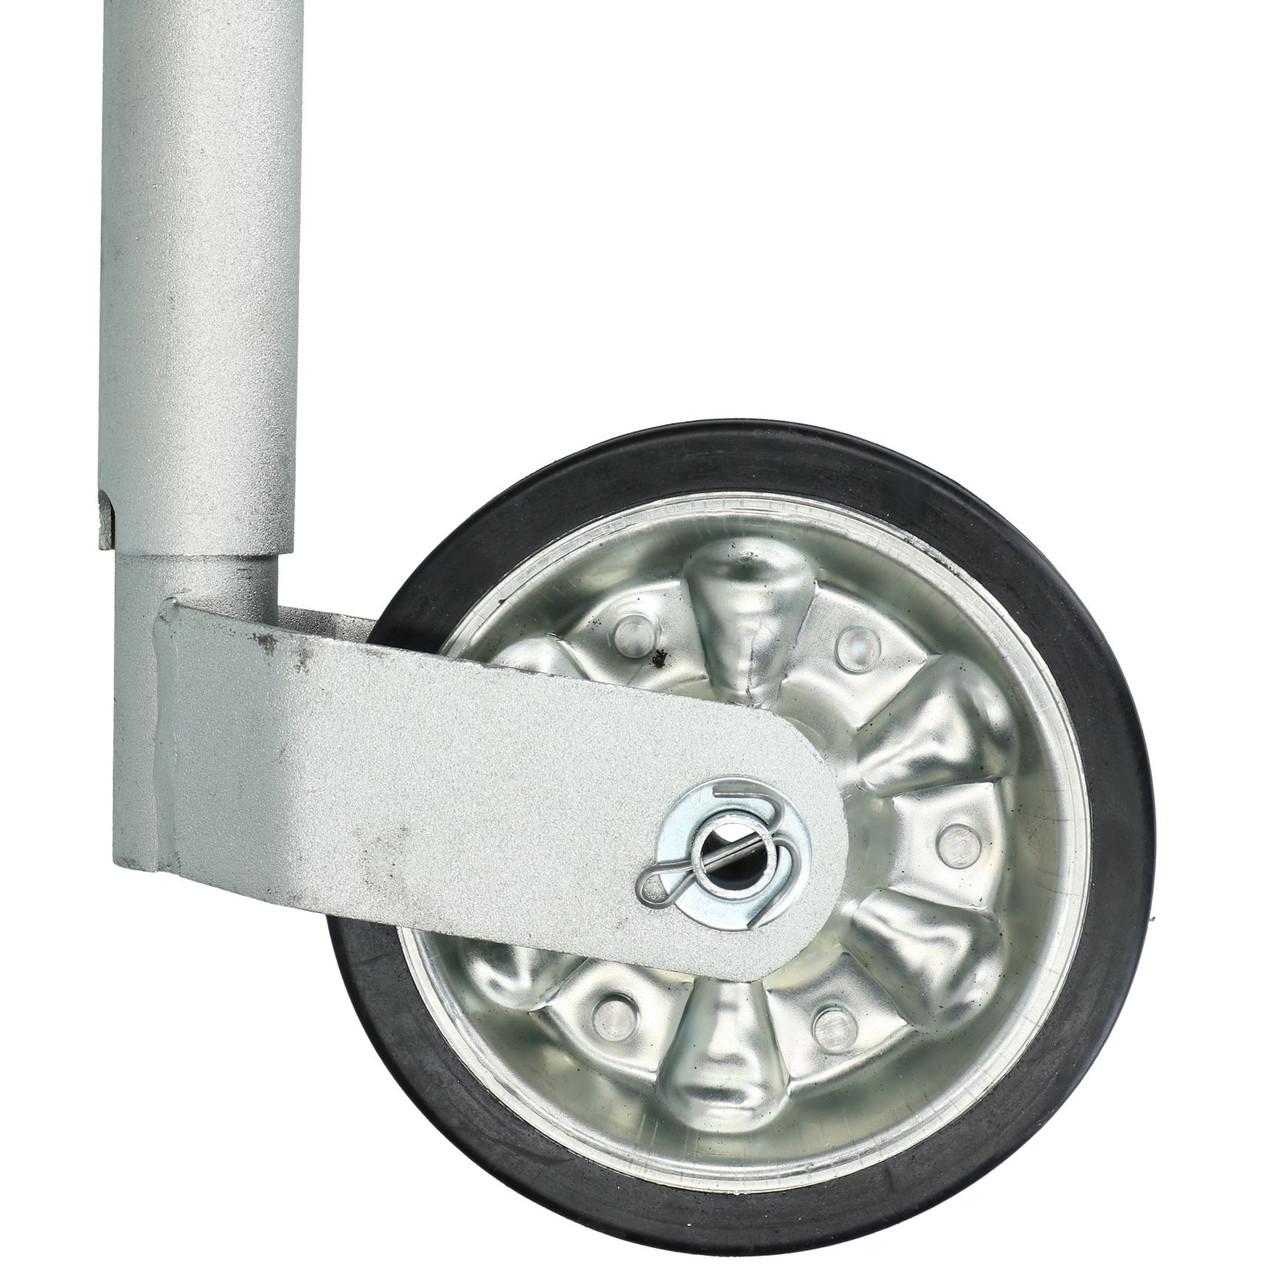 48mm Jockey Wheel for Trailer Caravan Horse Box Heavy Duty 400kg Max Nose